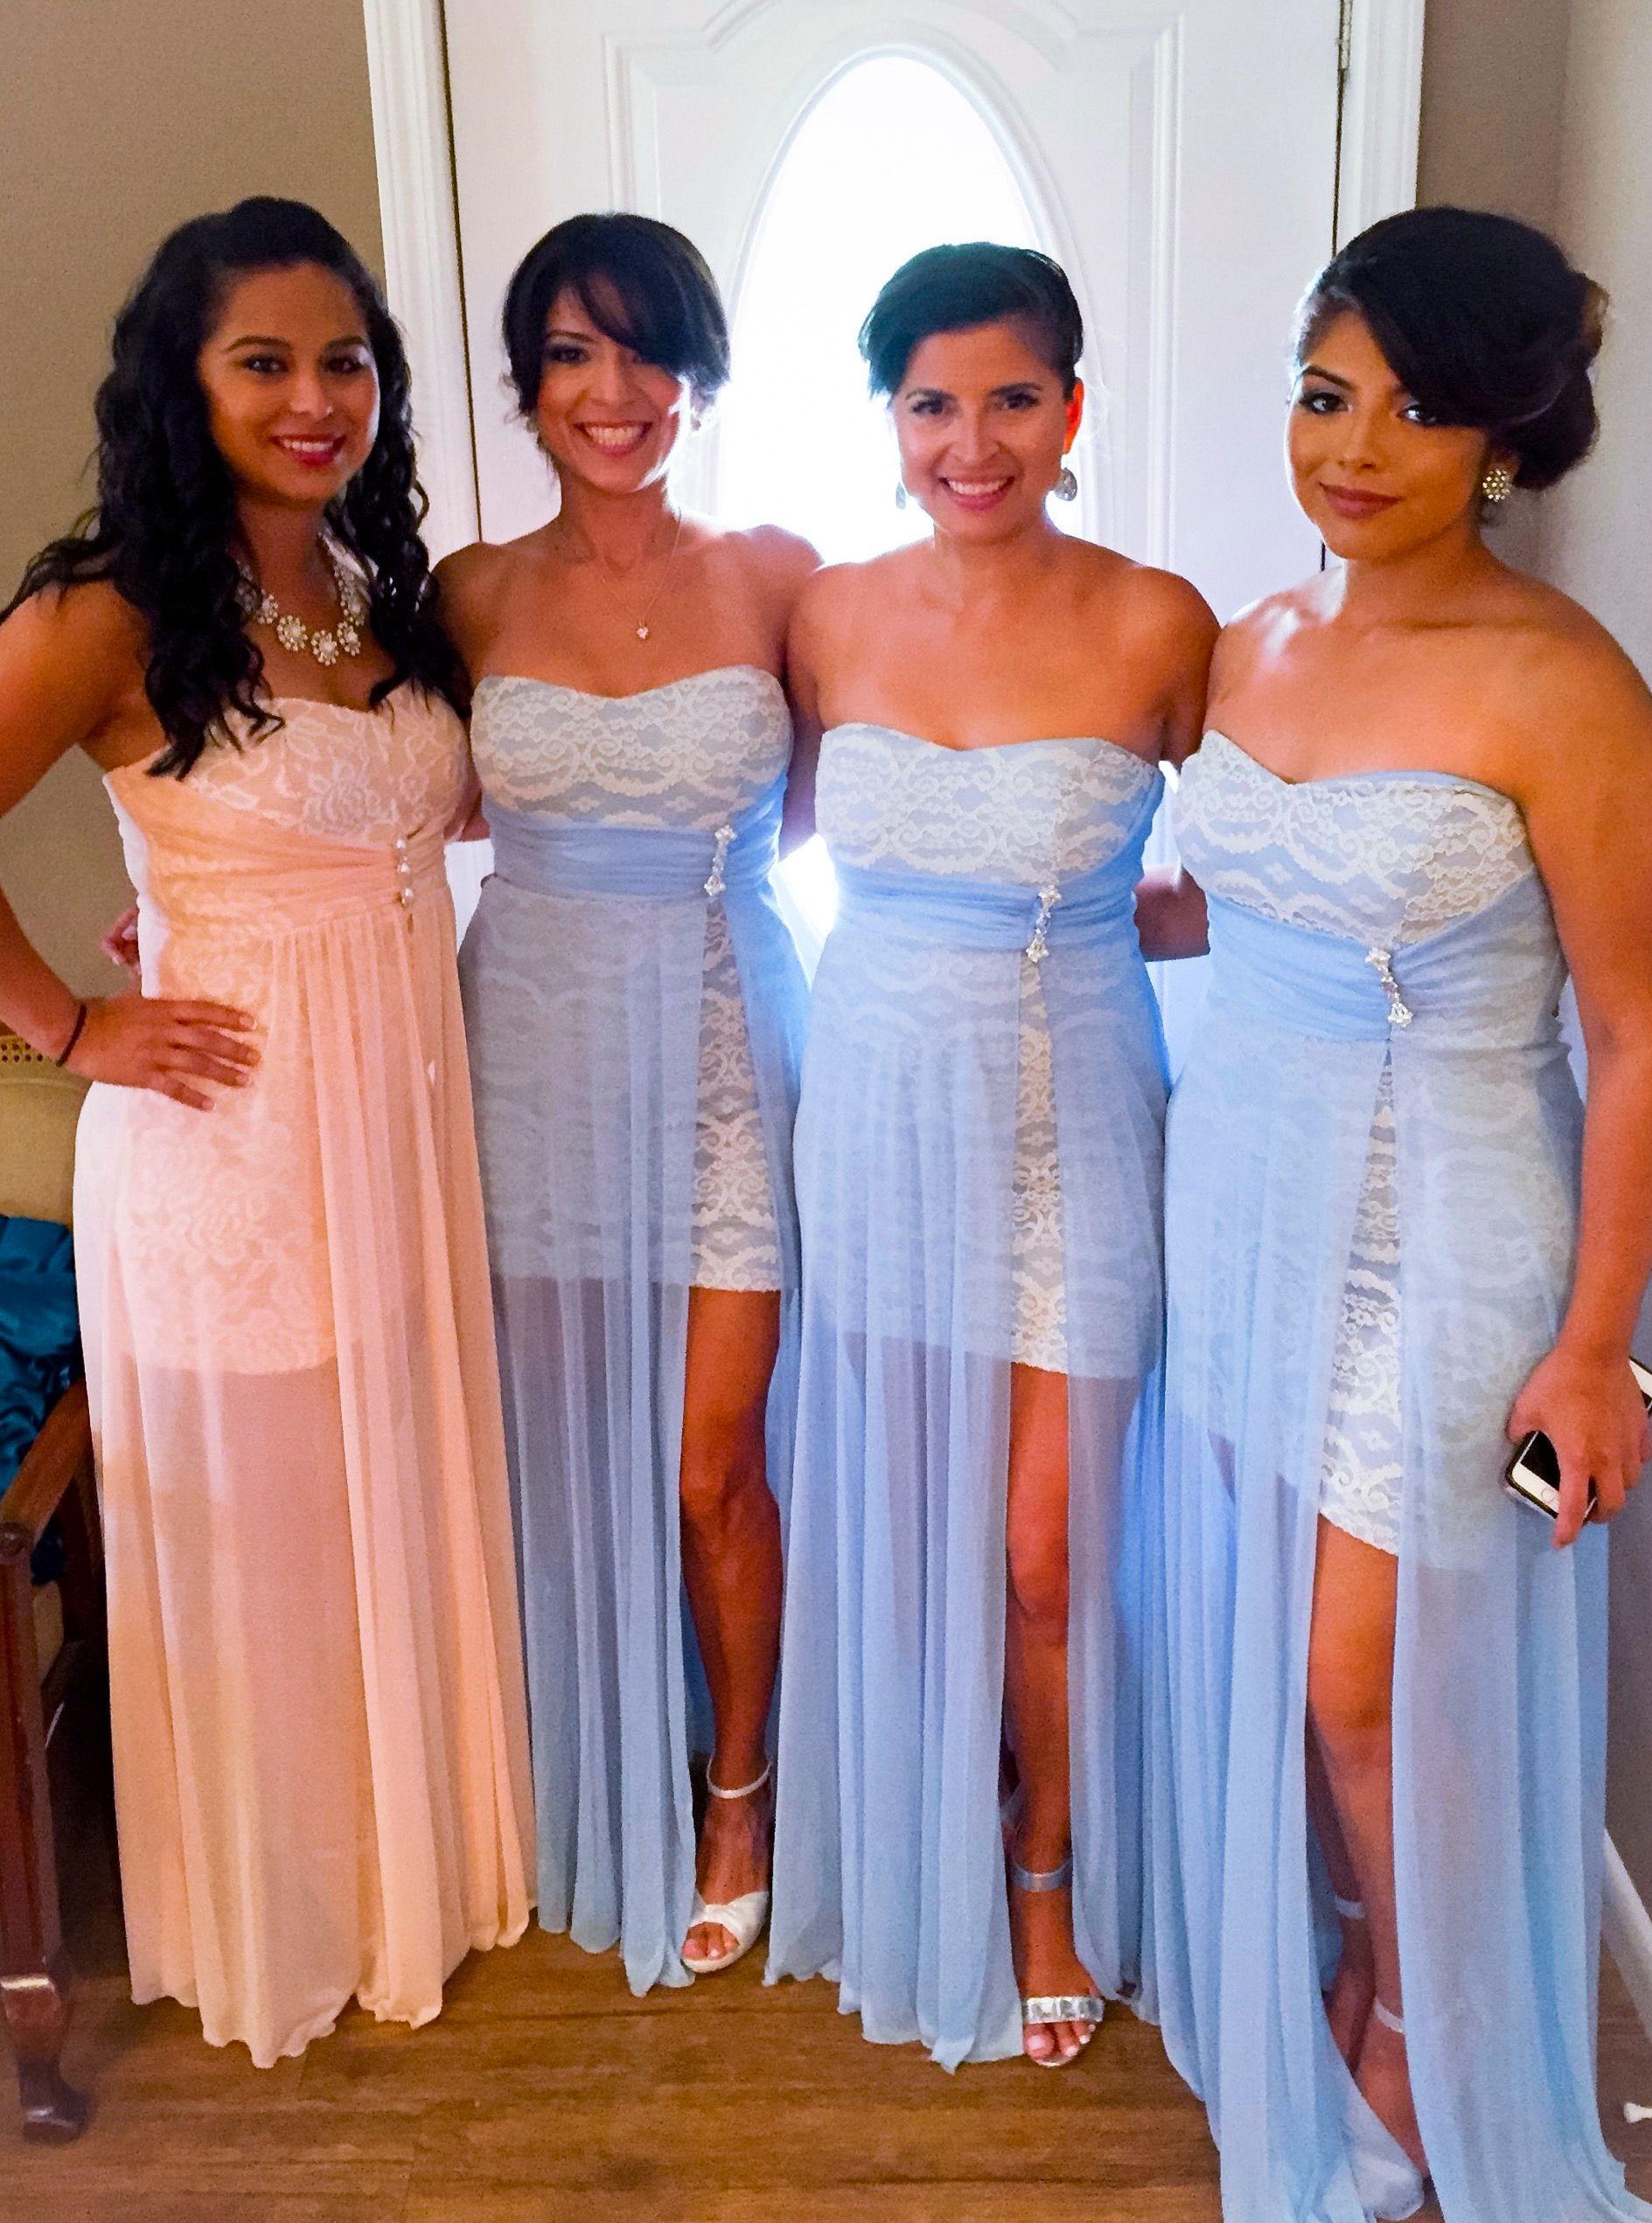 bridesmaid style amalia in shown blue light lighting dresses